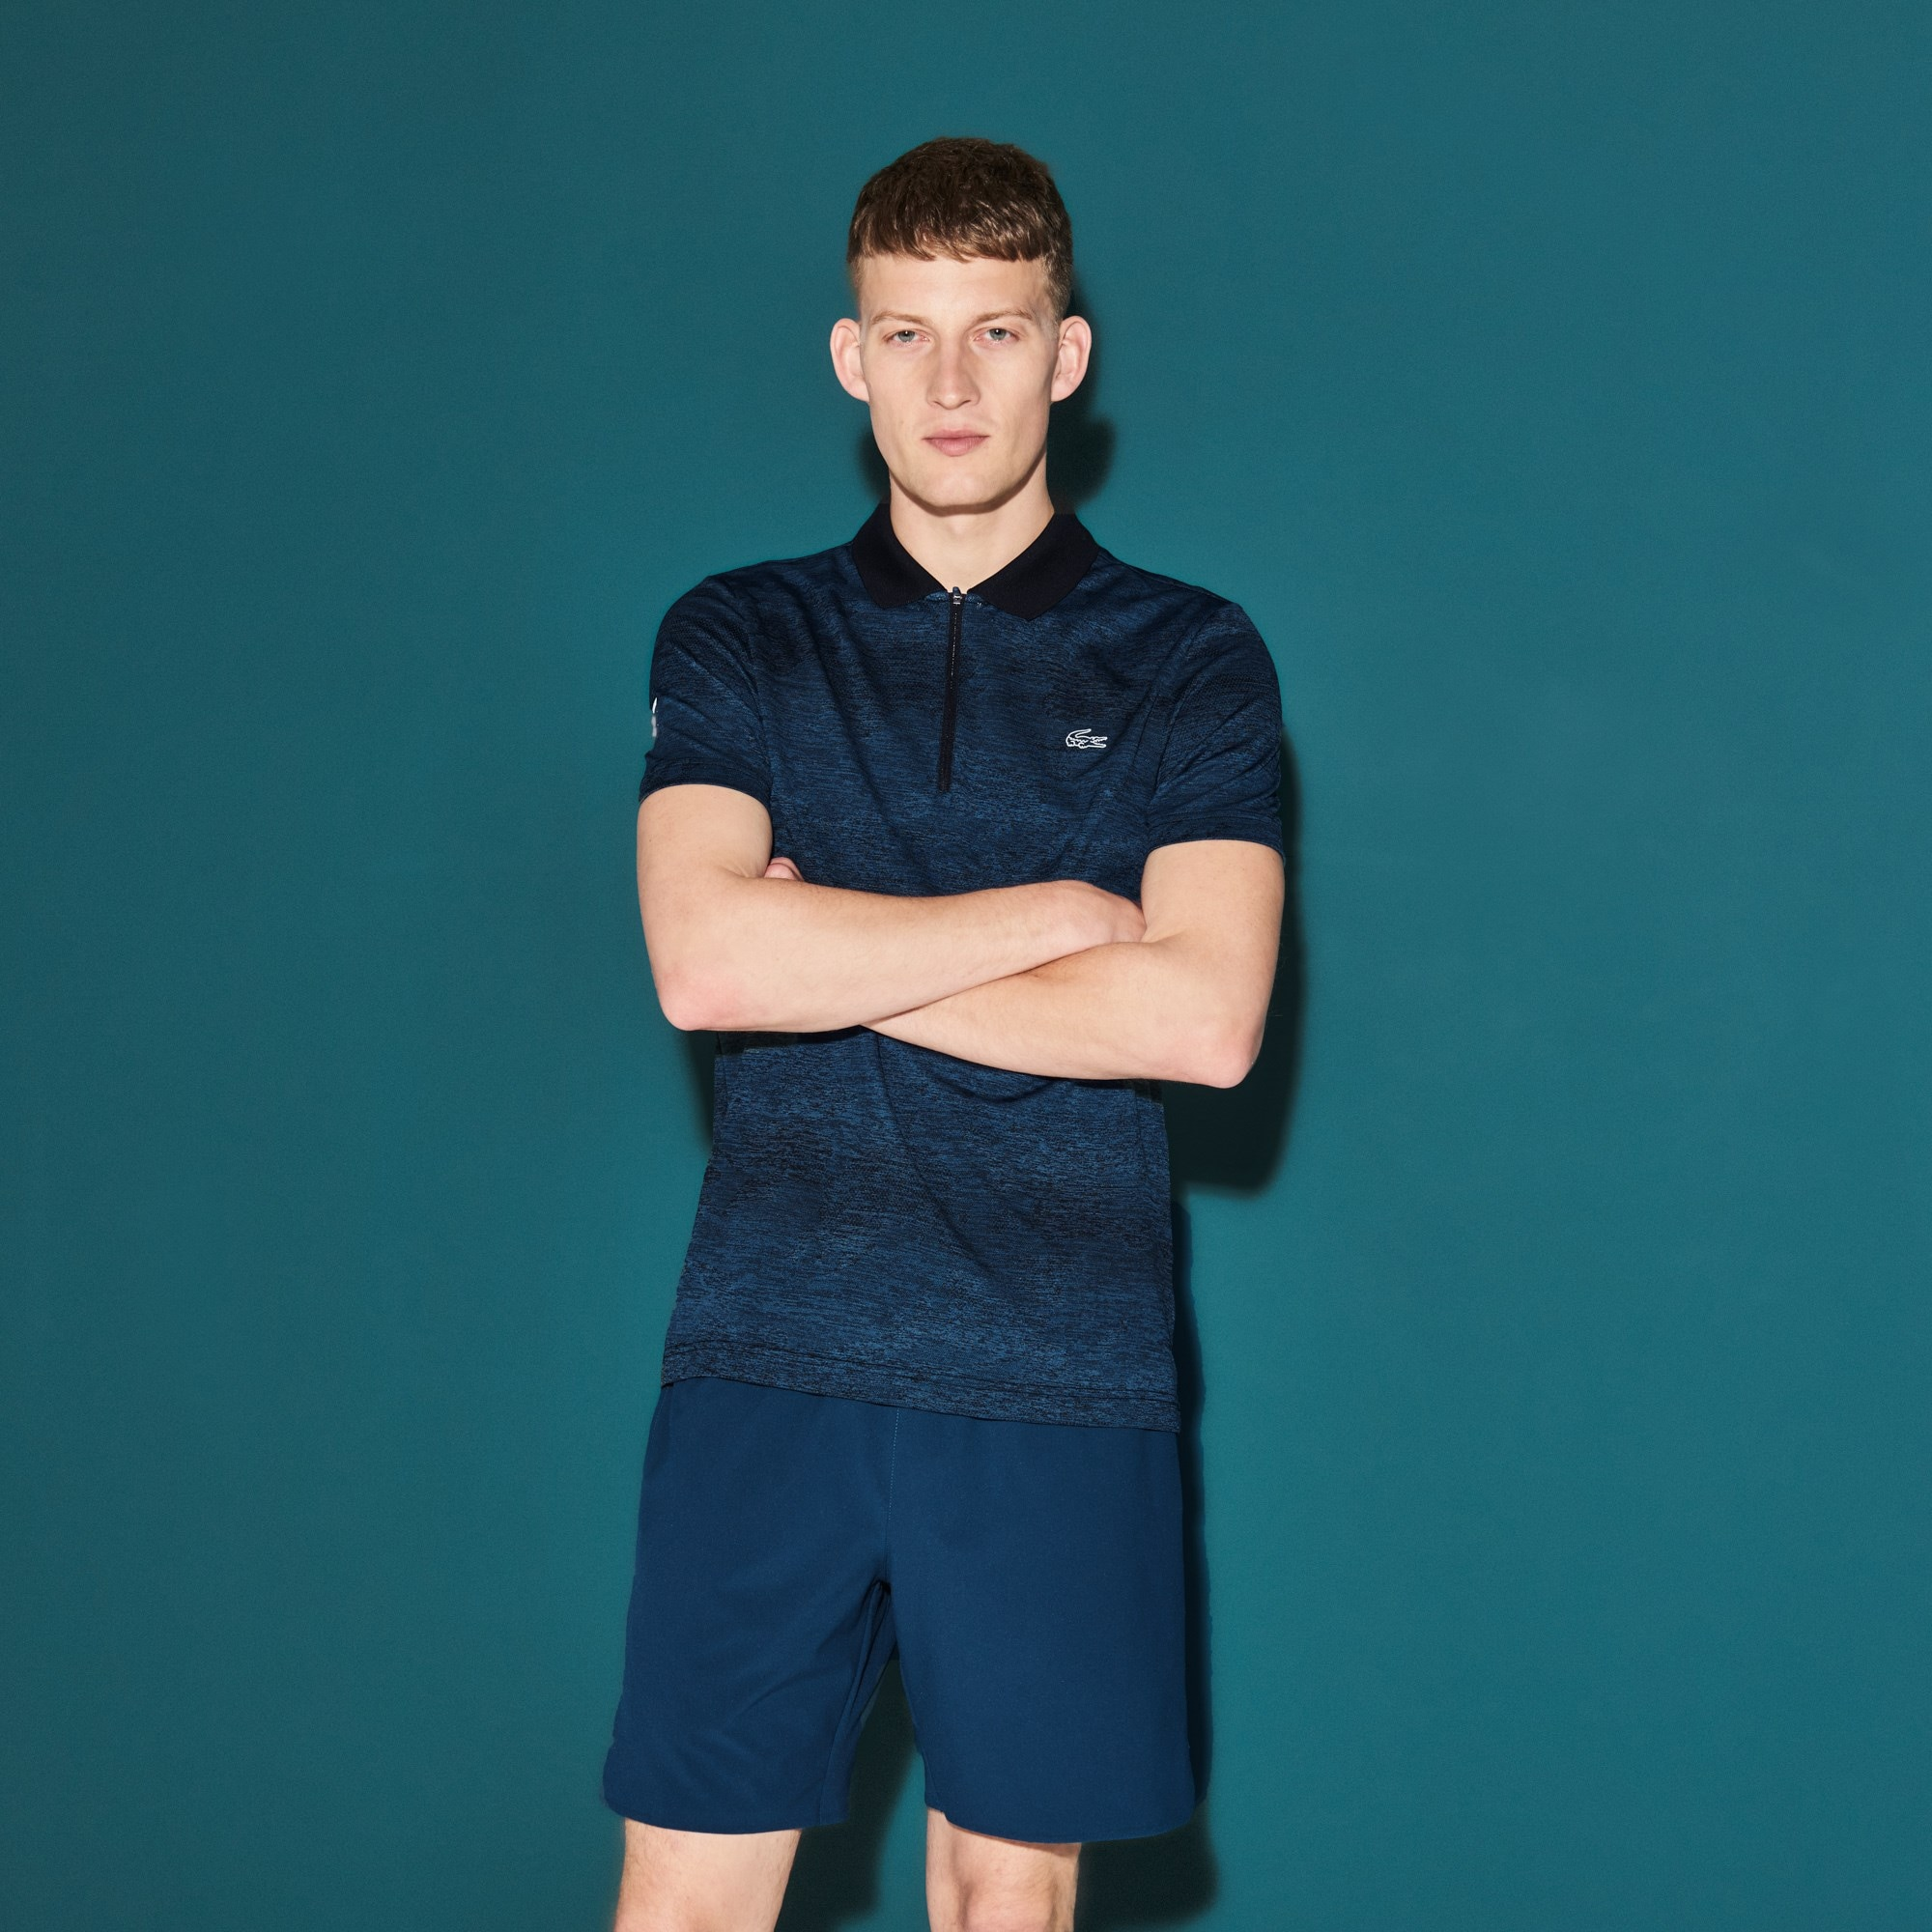 Herren LACOSTE SPORT Print-Tennis Poloshirt